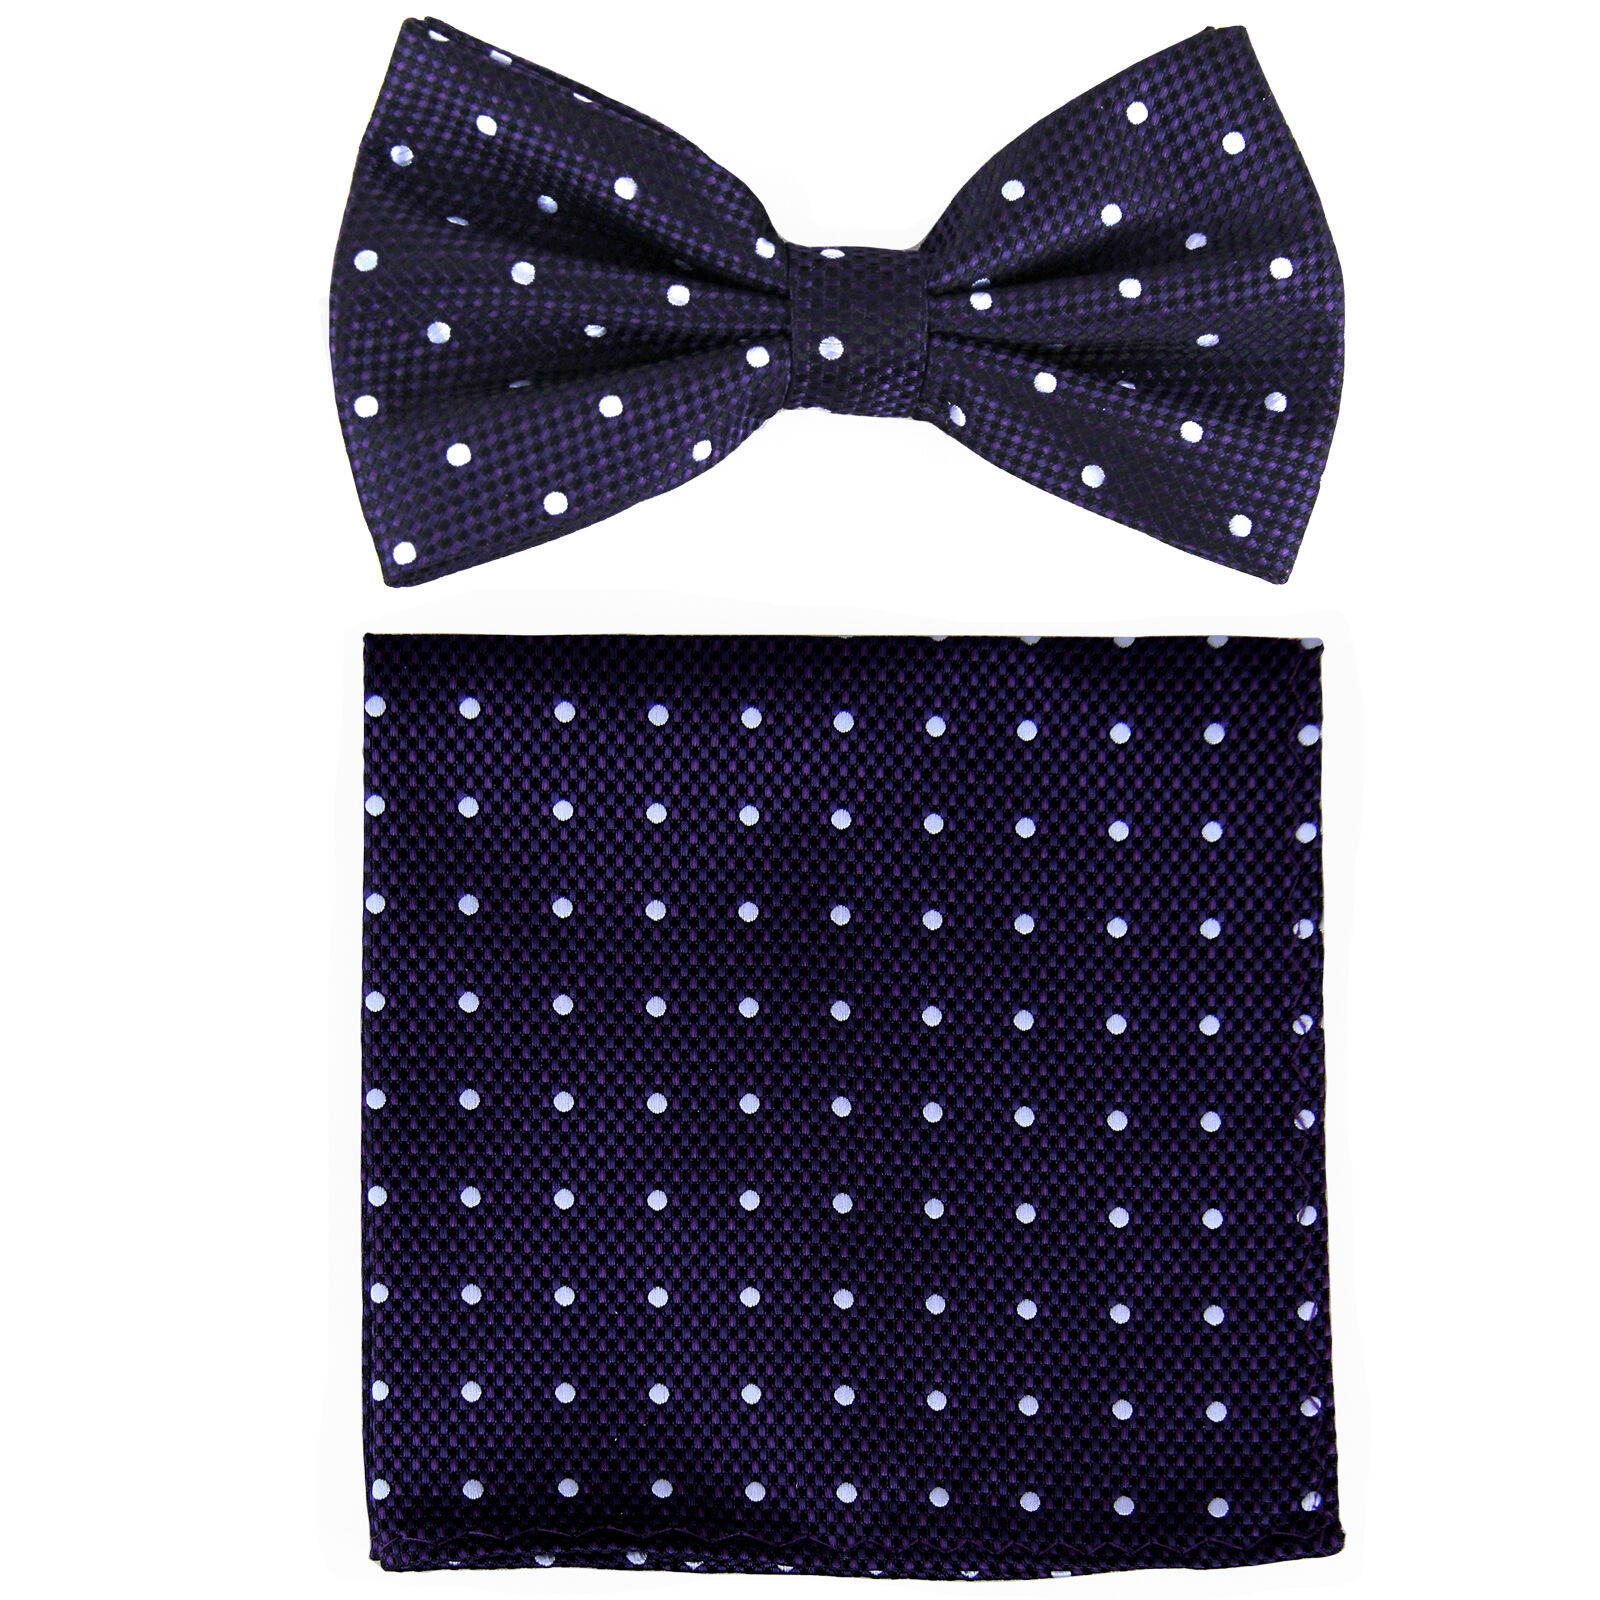 New Brand Q Men's Pre-tied Bow Tie & hankie purple white polka dots formal